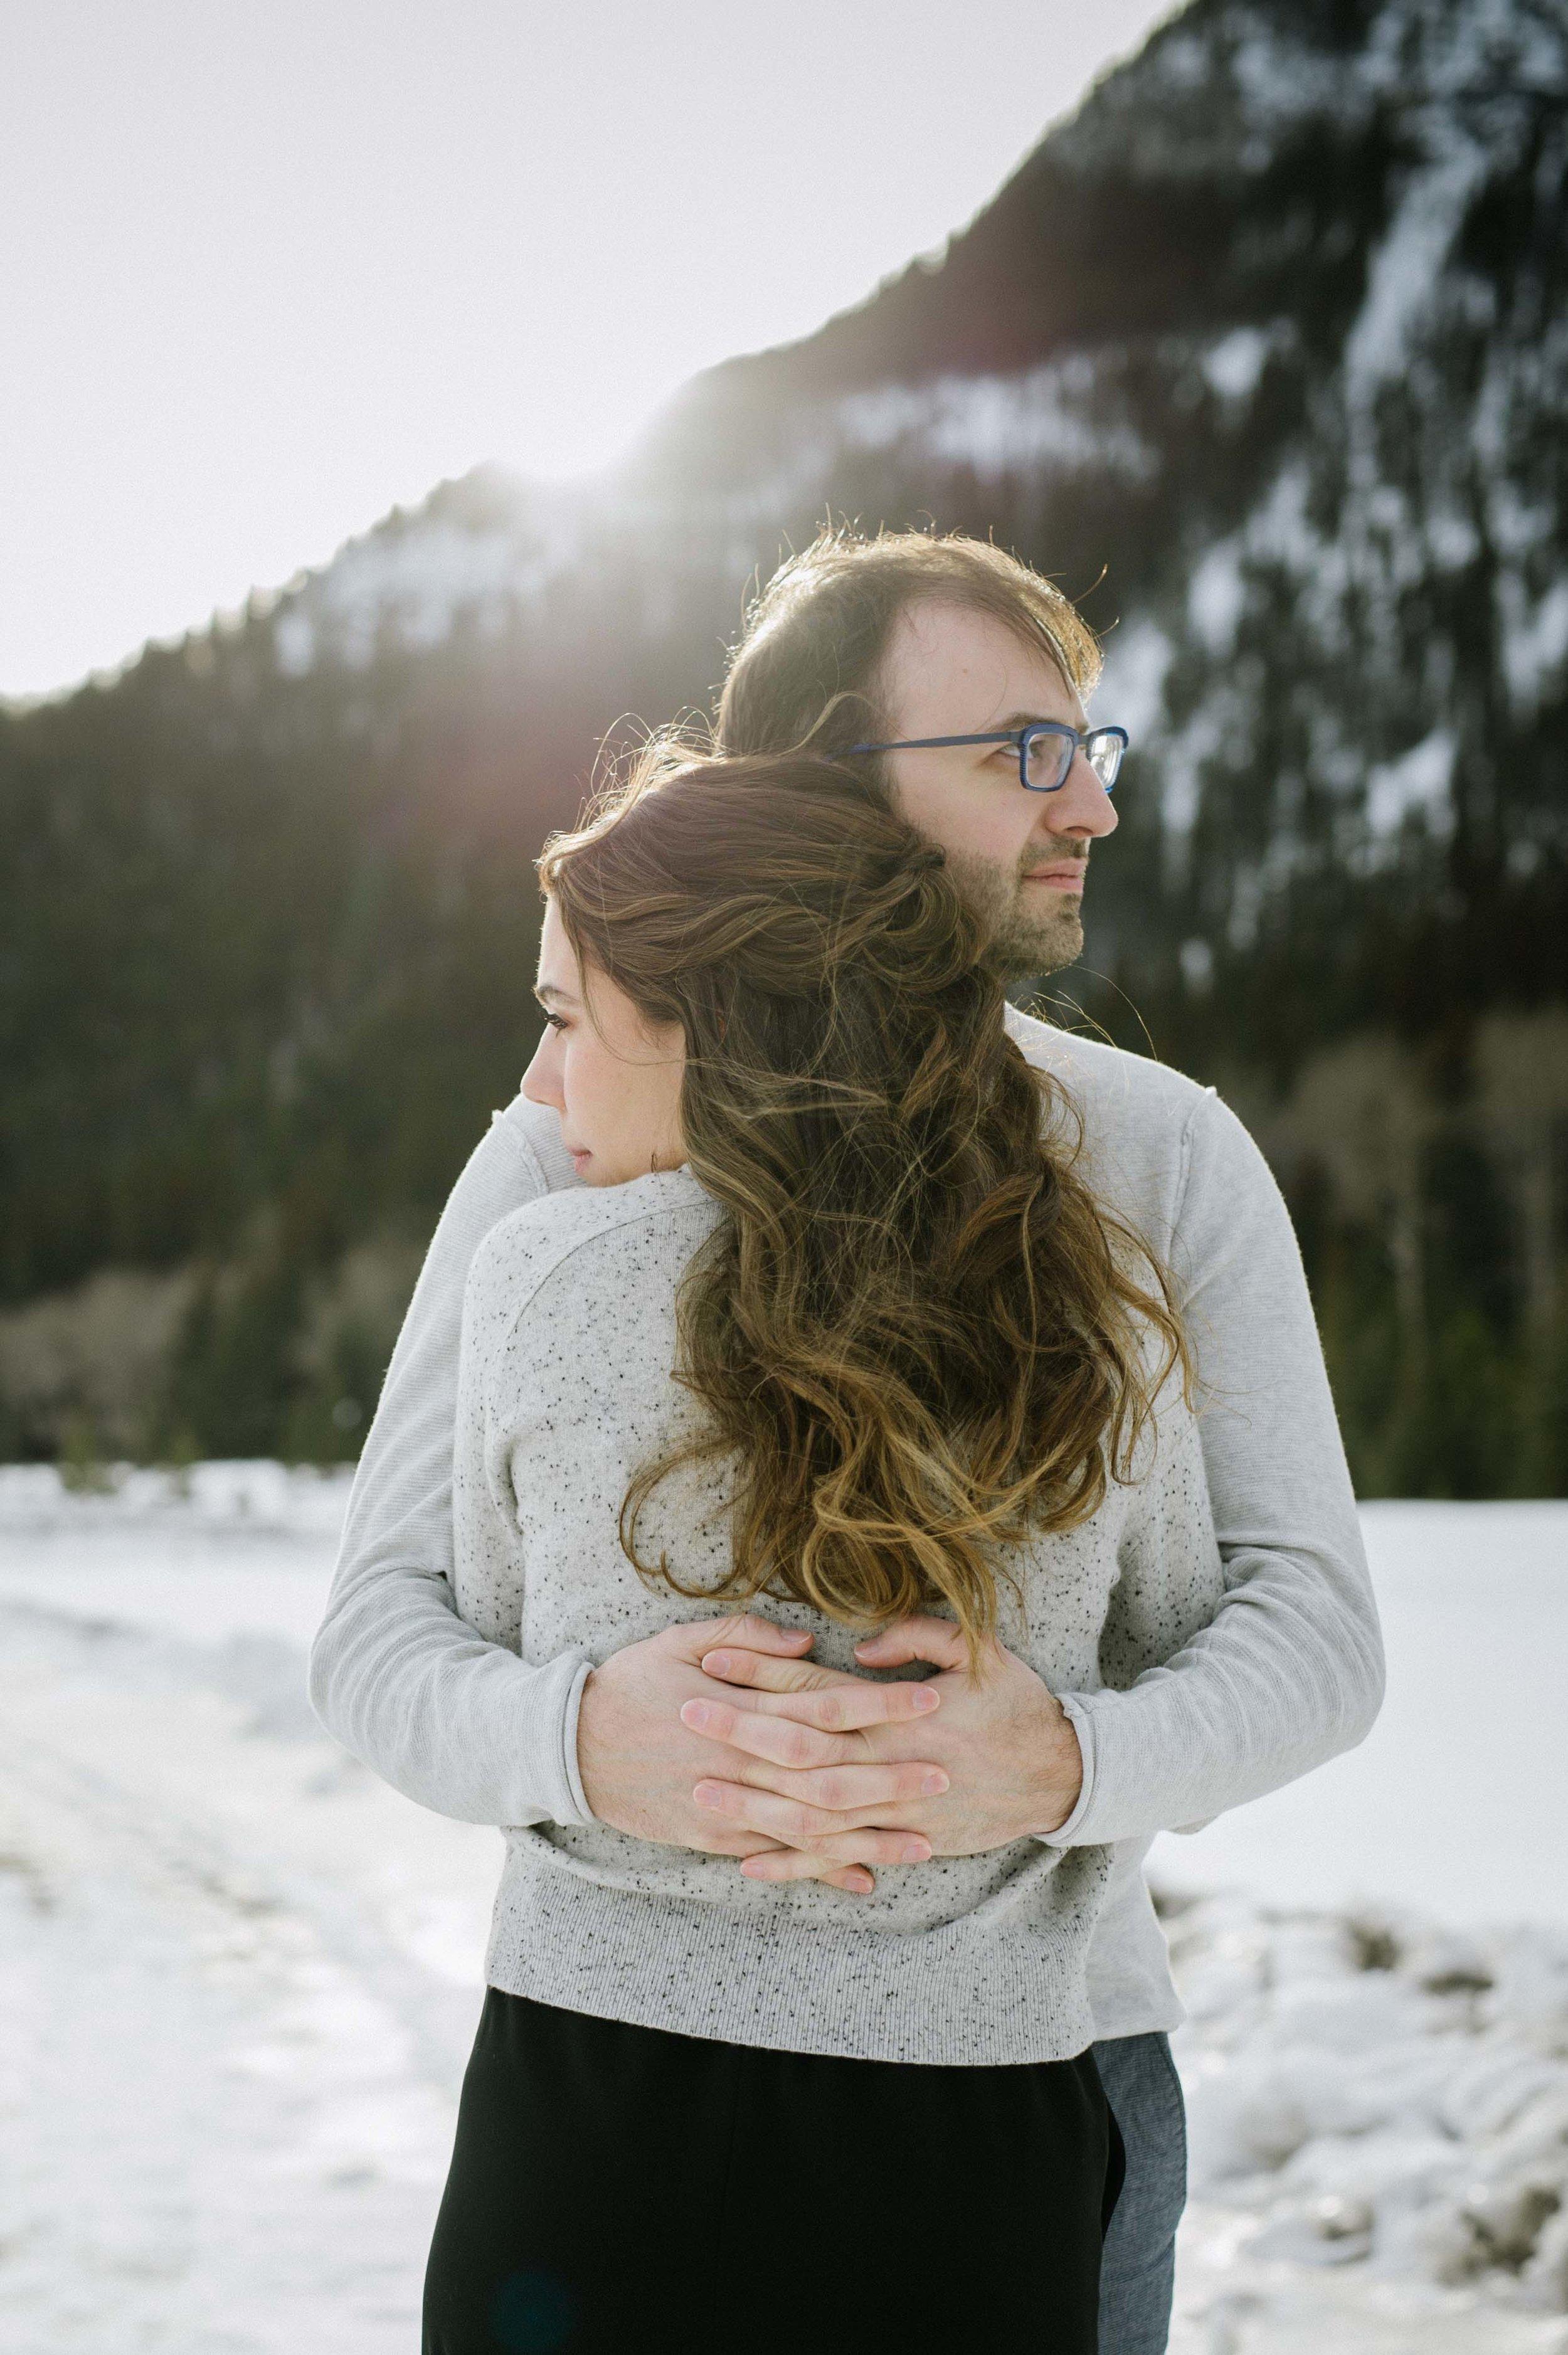 Christy-D-Swanberg-Photography-Calgary-Engagements-Banff-01.jpg